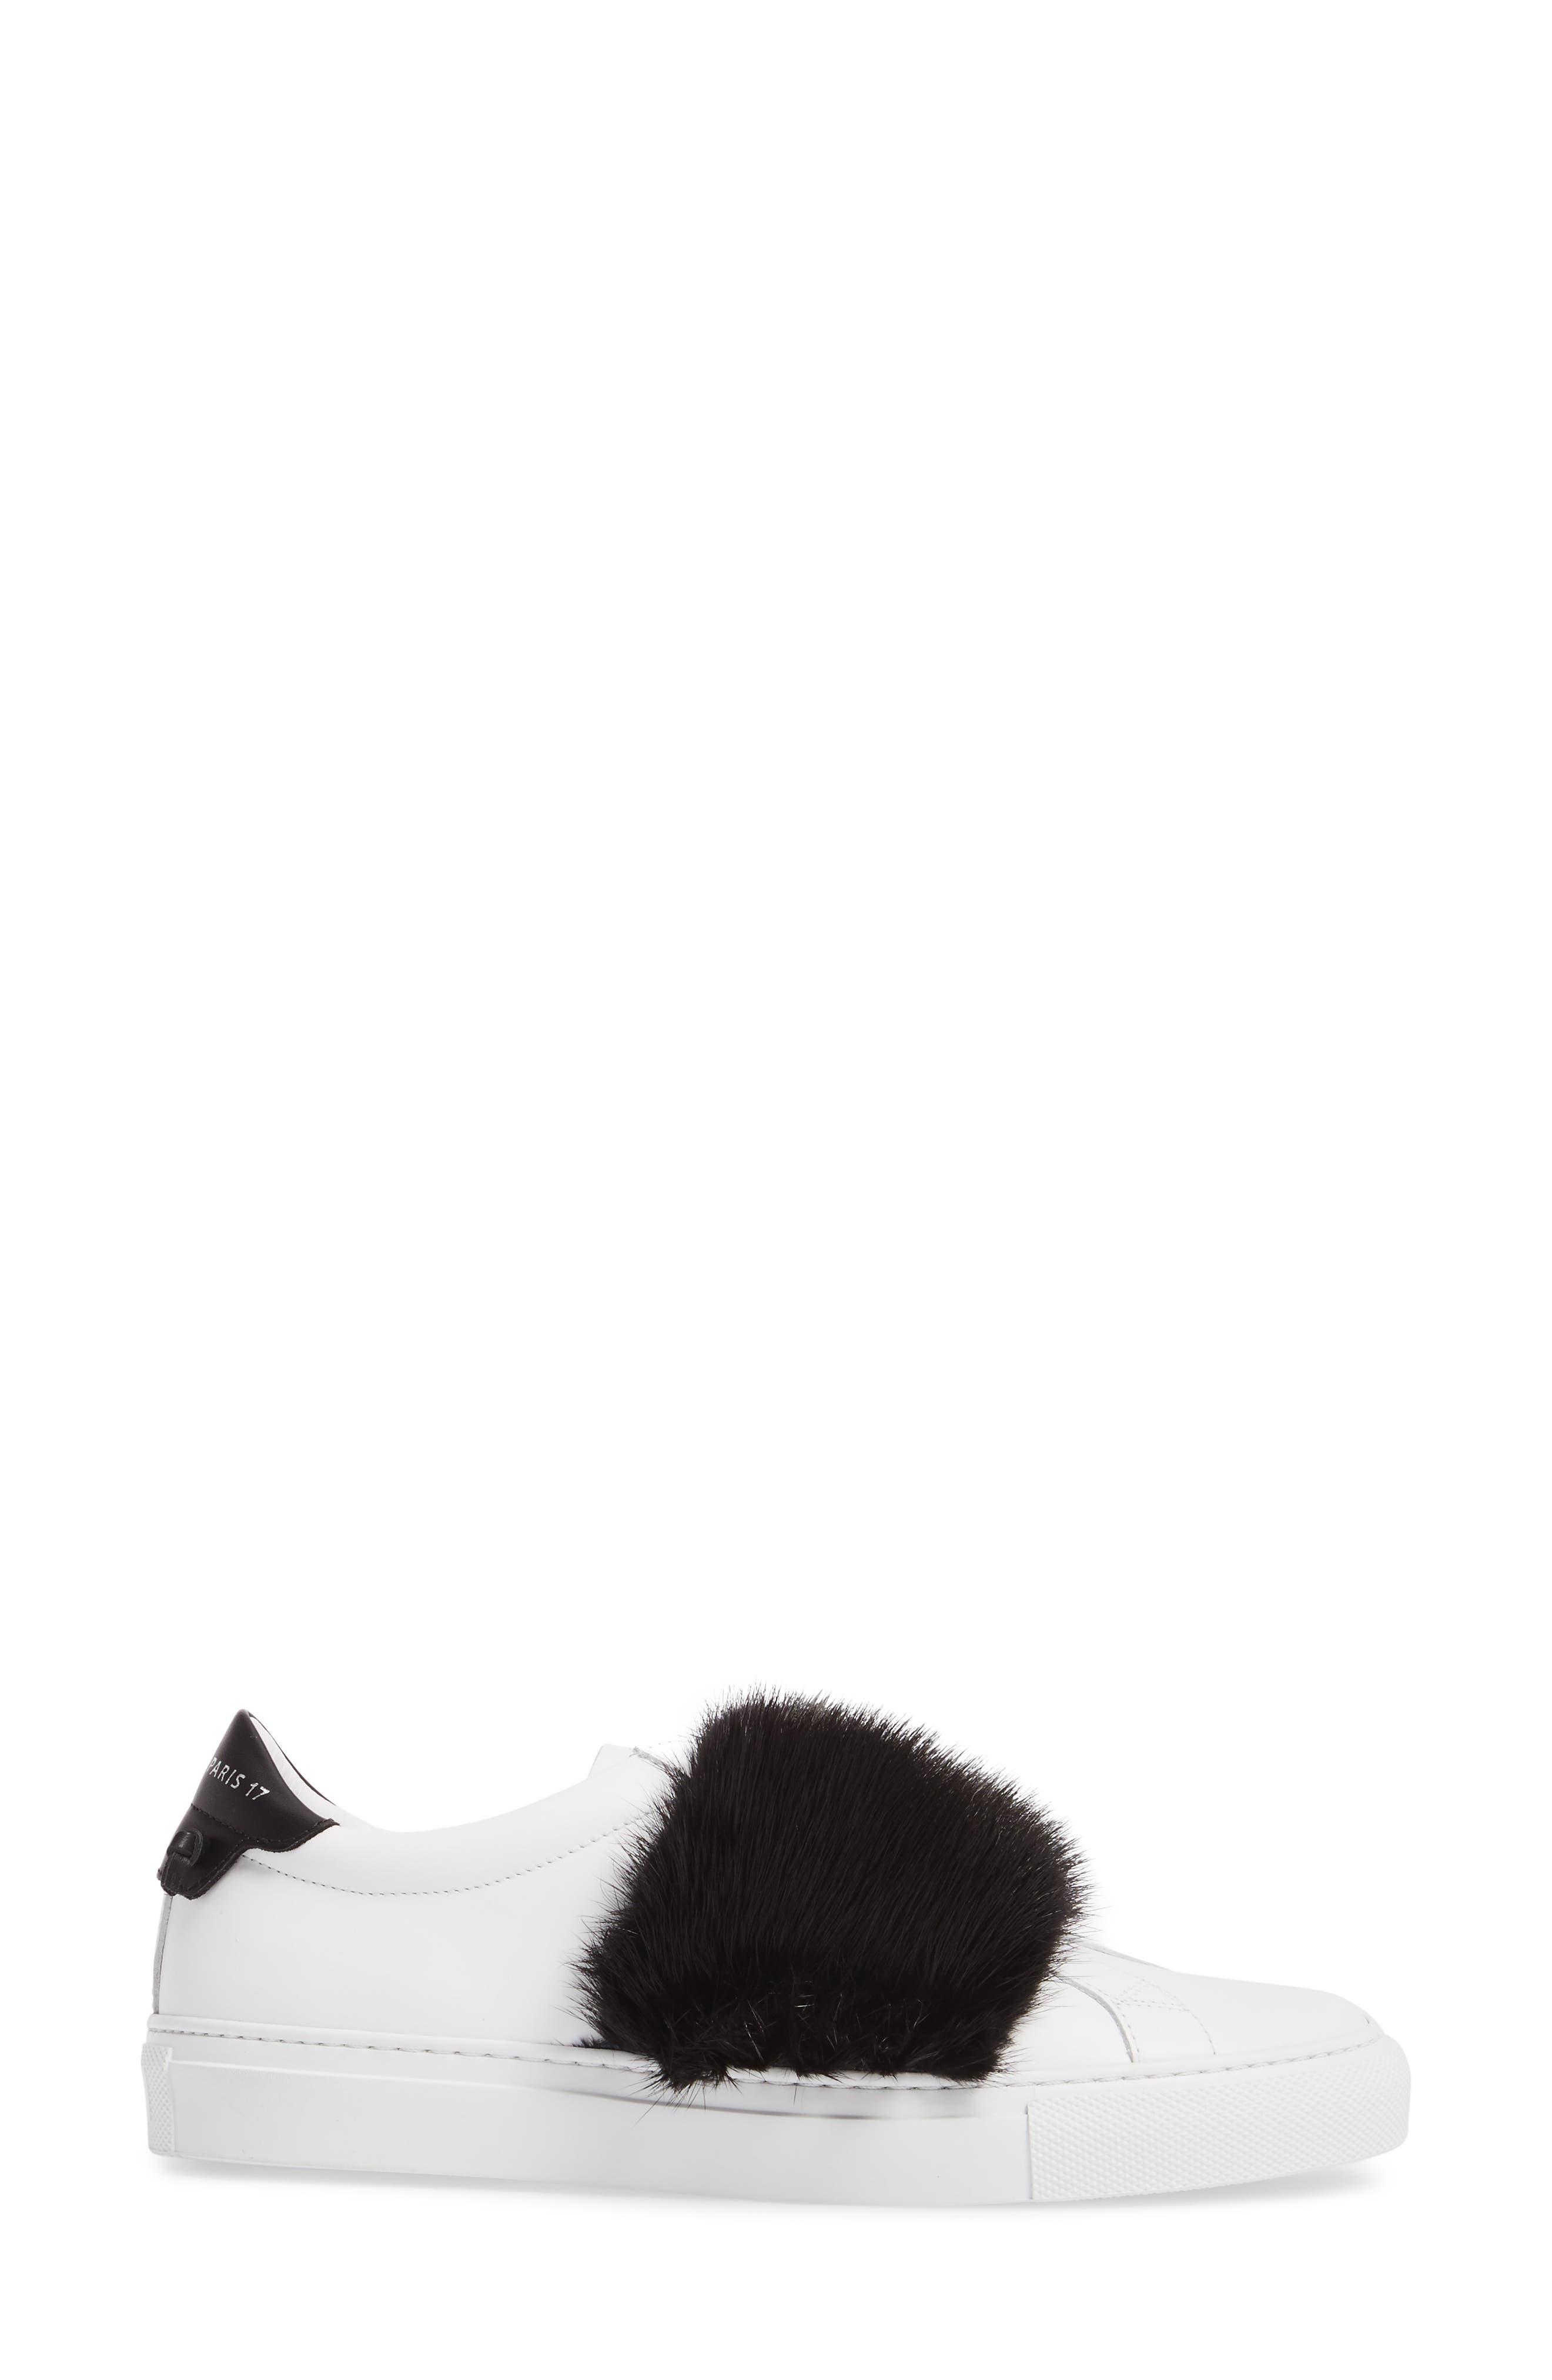 Urban Street Slip-On Sneaker with Genuine Mink Fur Trim,                             Alternate thumbnail 9, color,